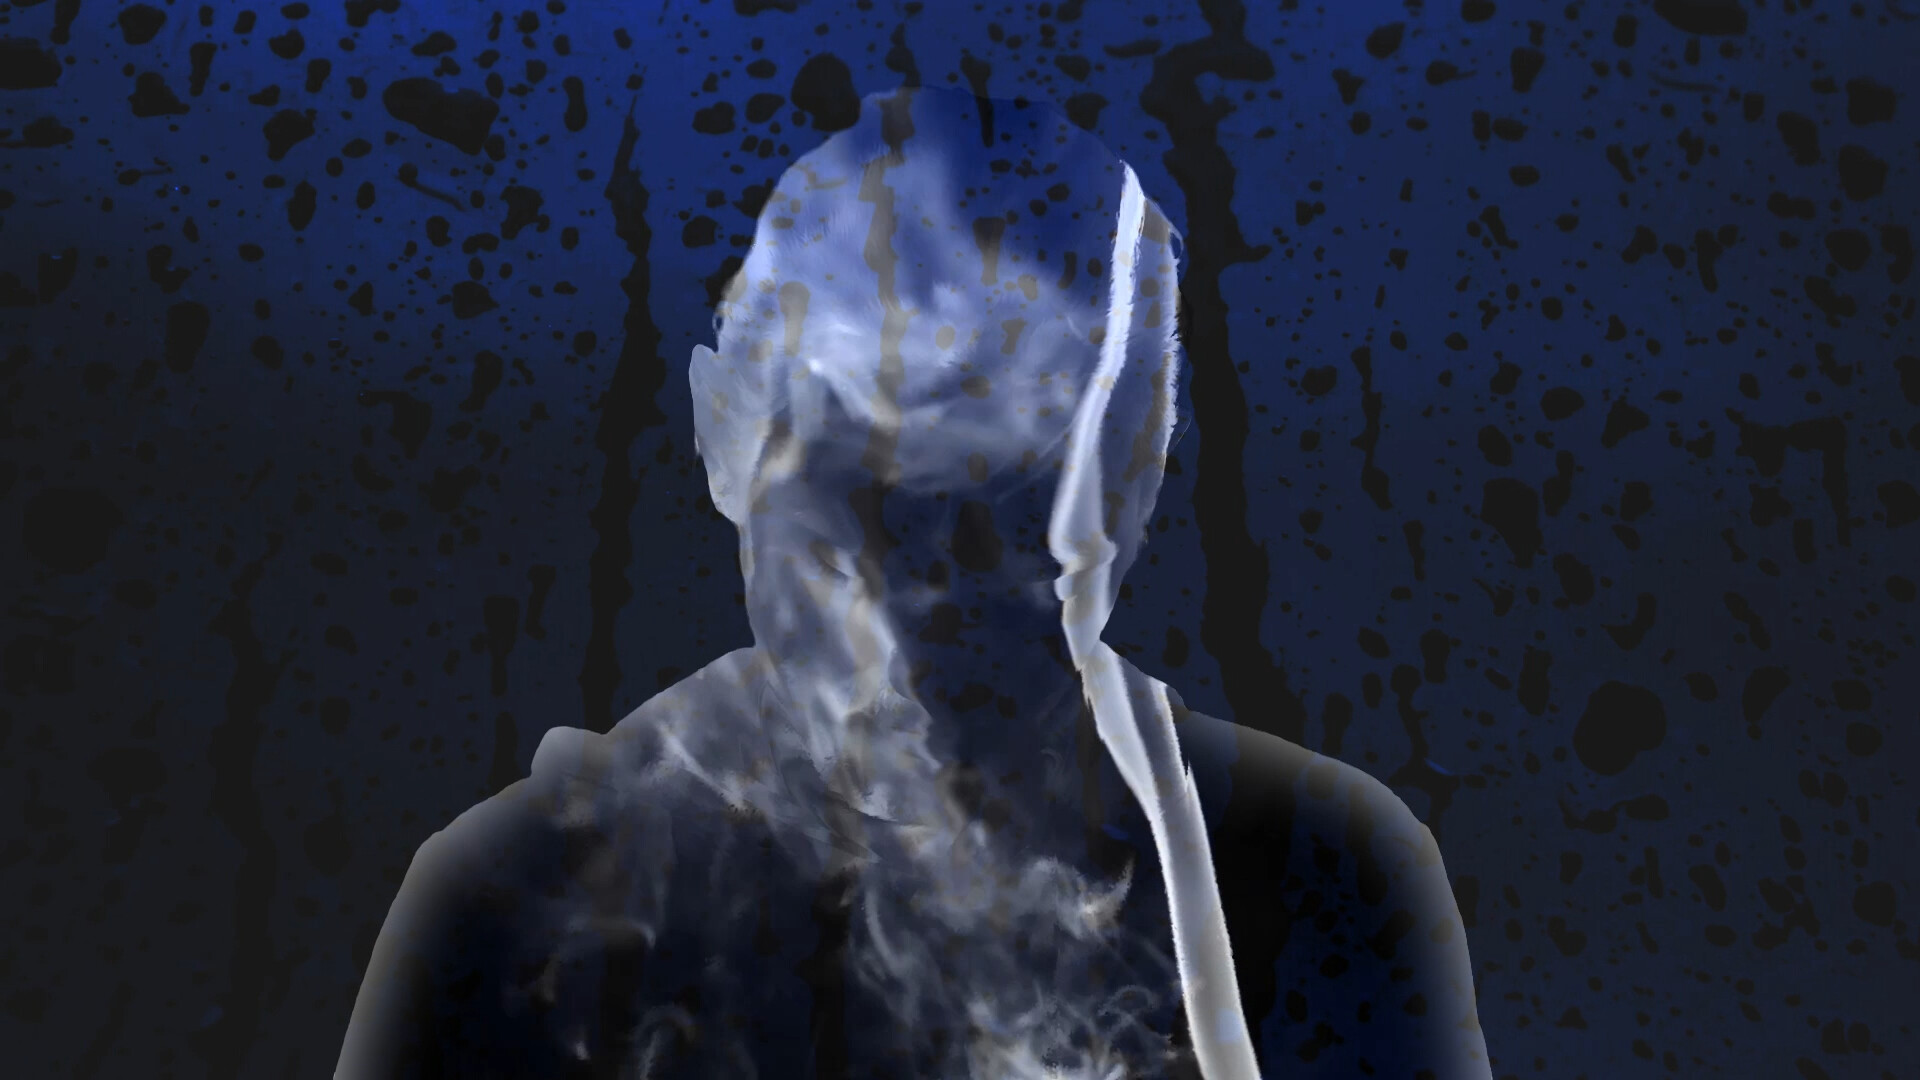 Simón García Malheiro - Creepy Smoke Effects on After Effects